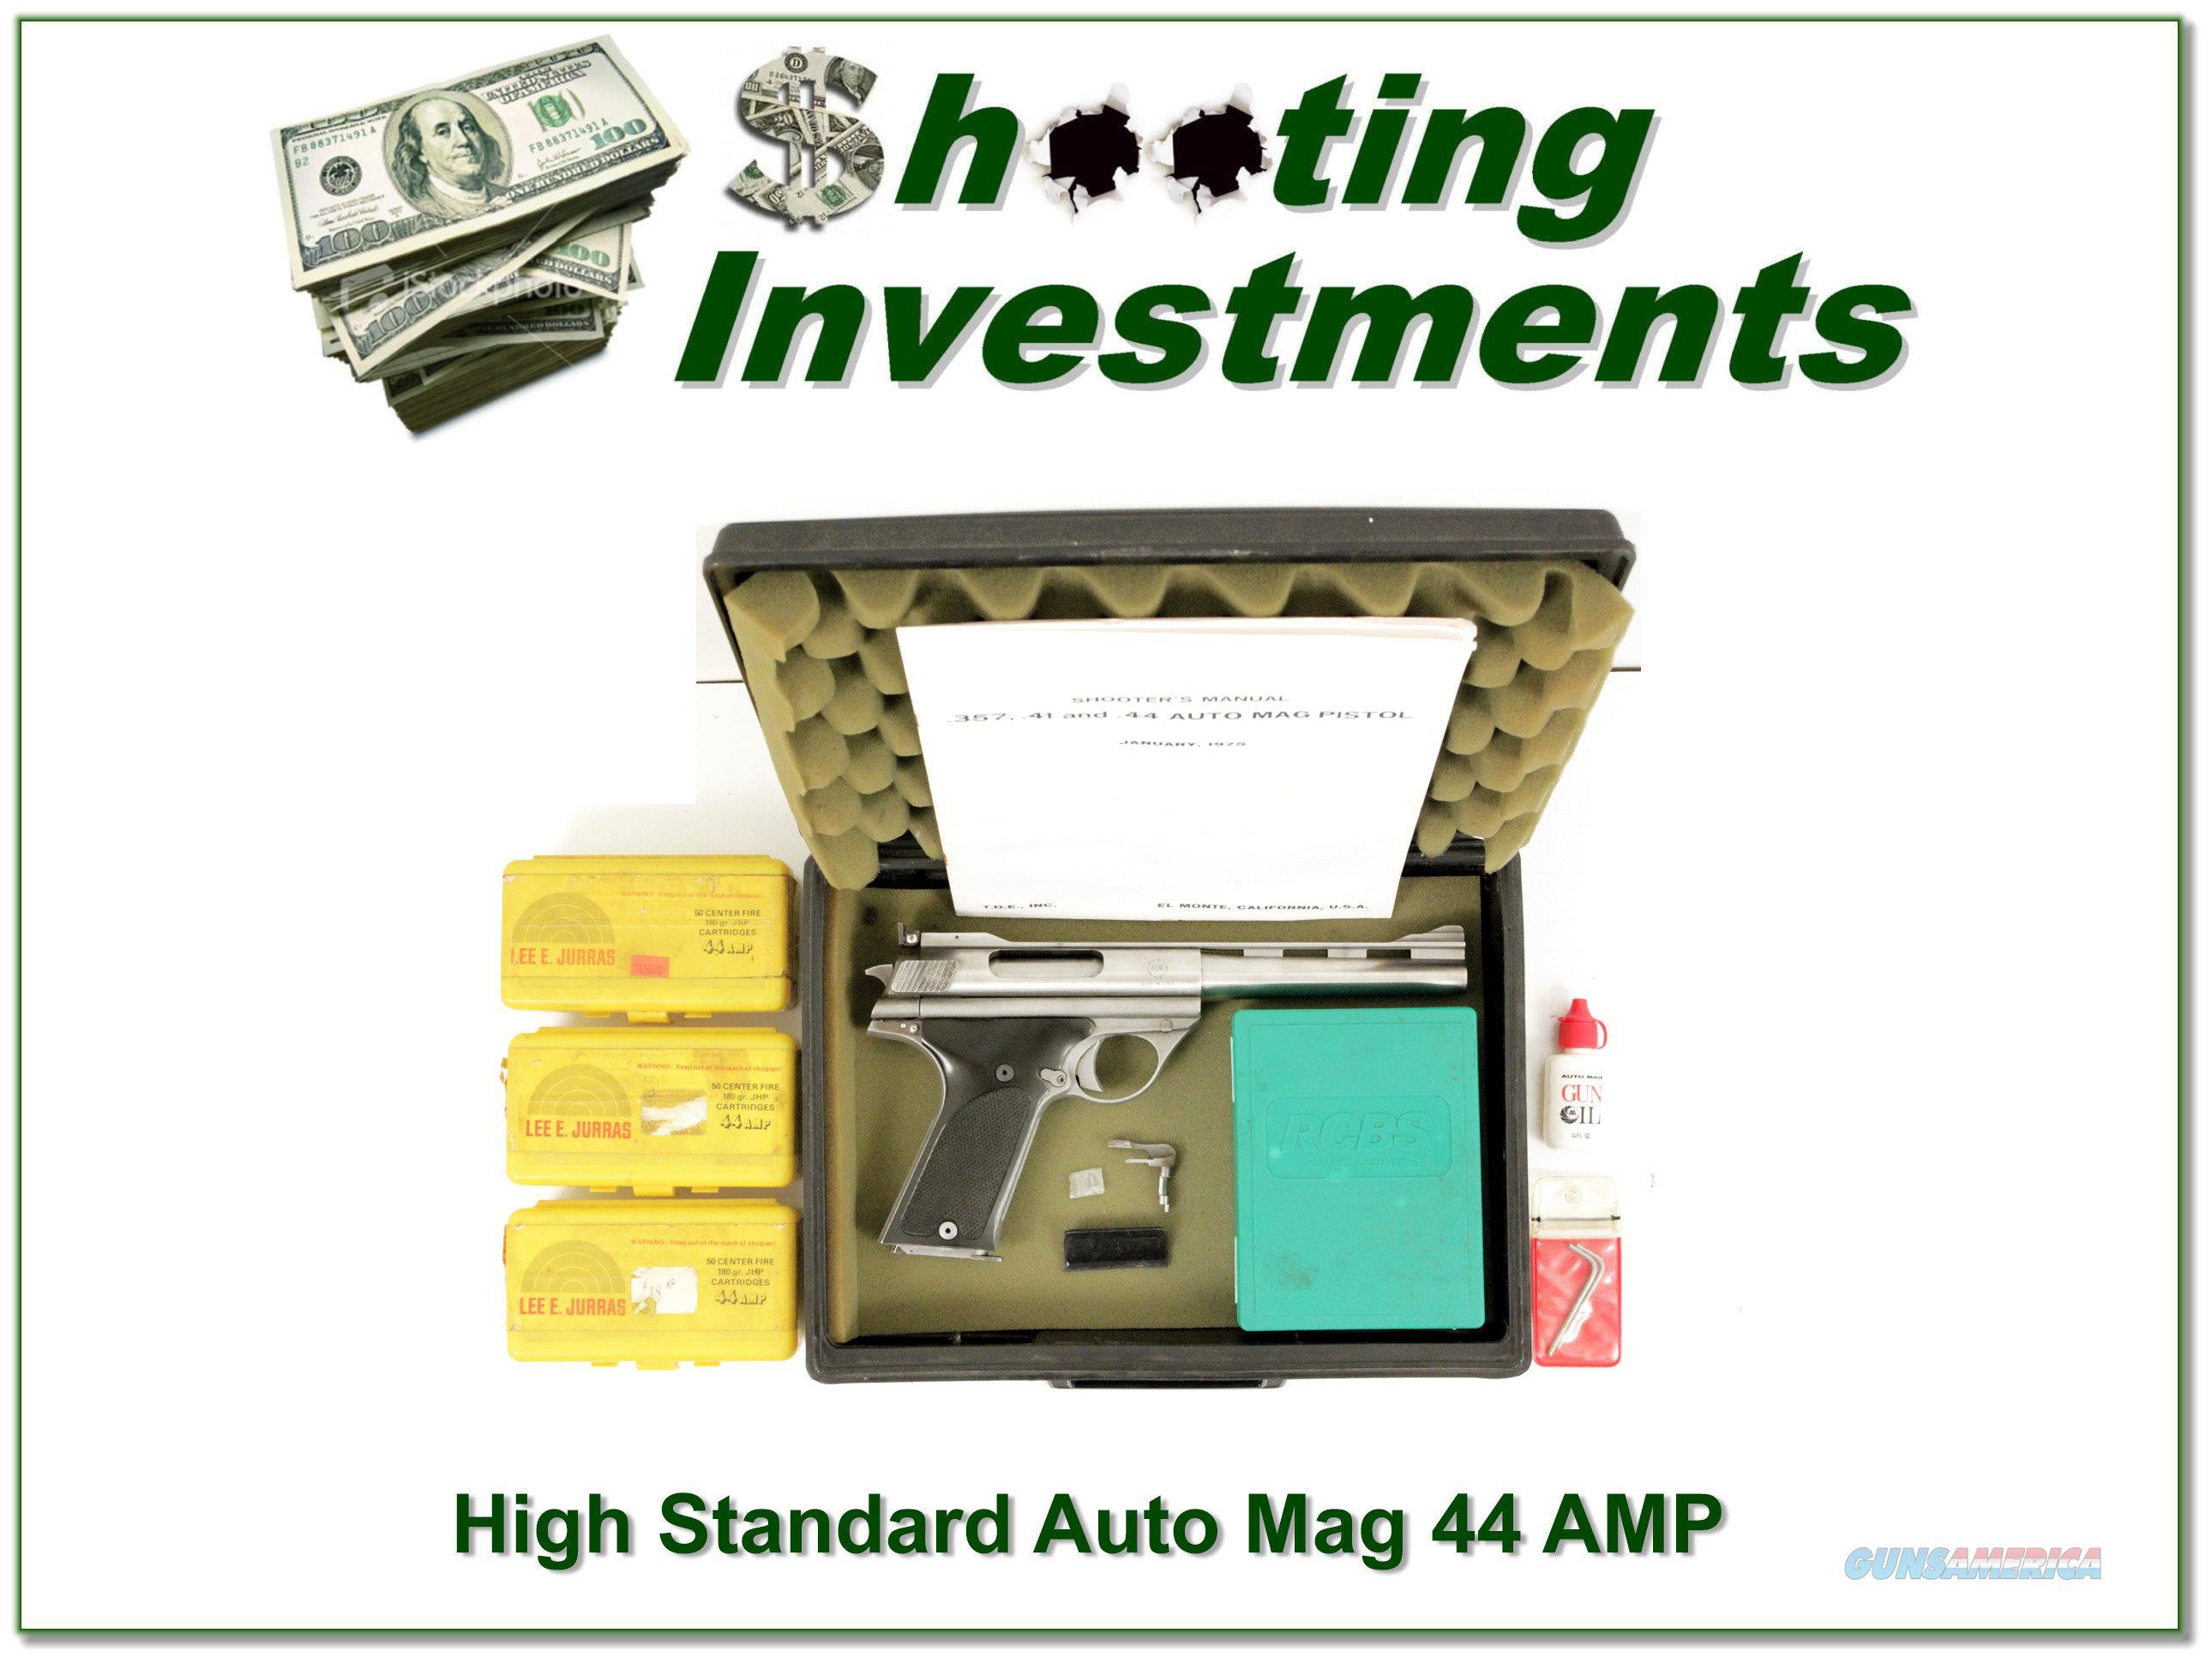 High Standard Model 180 .44 AMP in box with ammo  Guns > Pistols > High Standard Pistols